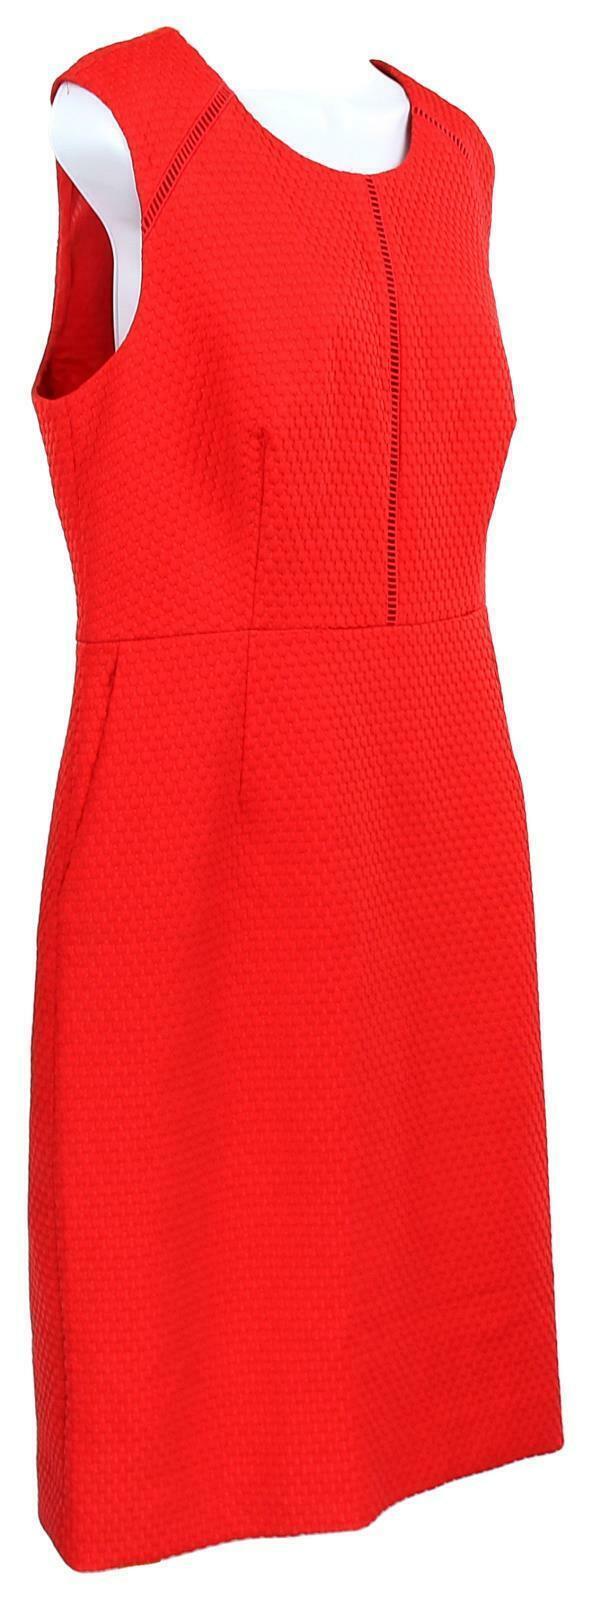 J Crew Women's Portfolio Sheath Dress /Suiting Career Work Red  12 F0791 image 2